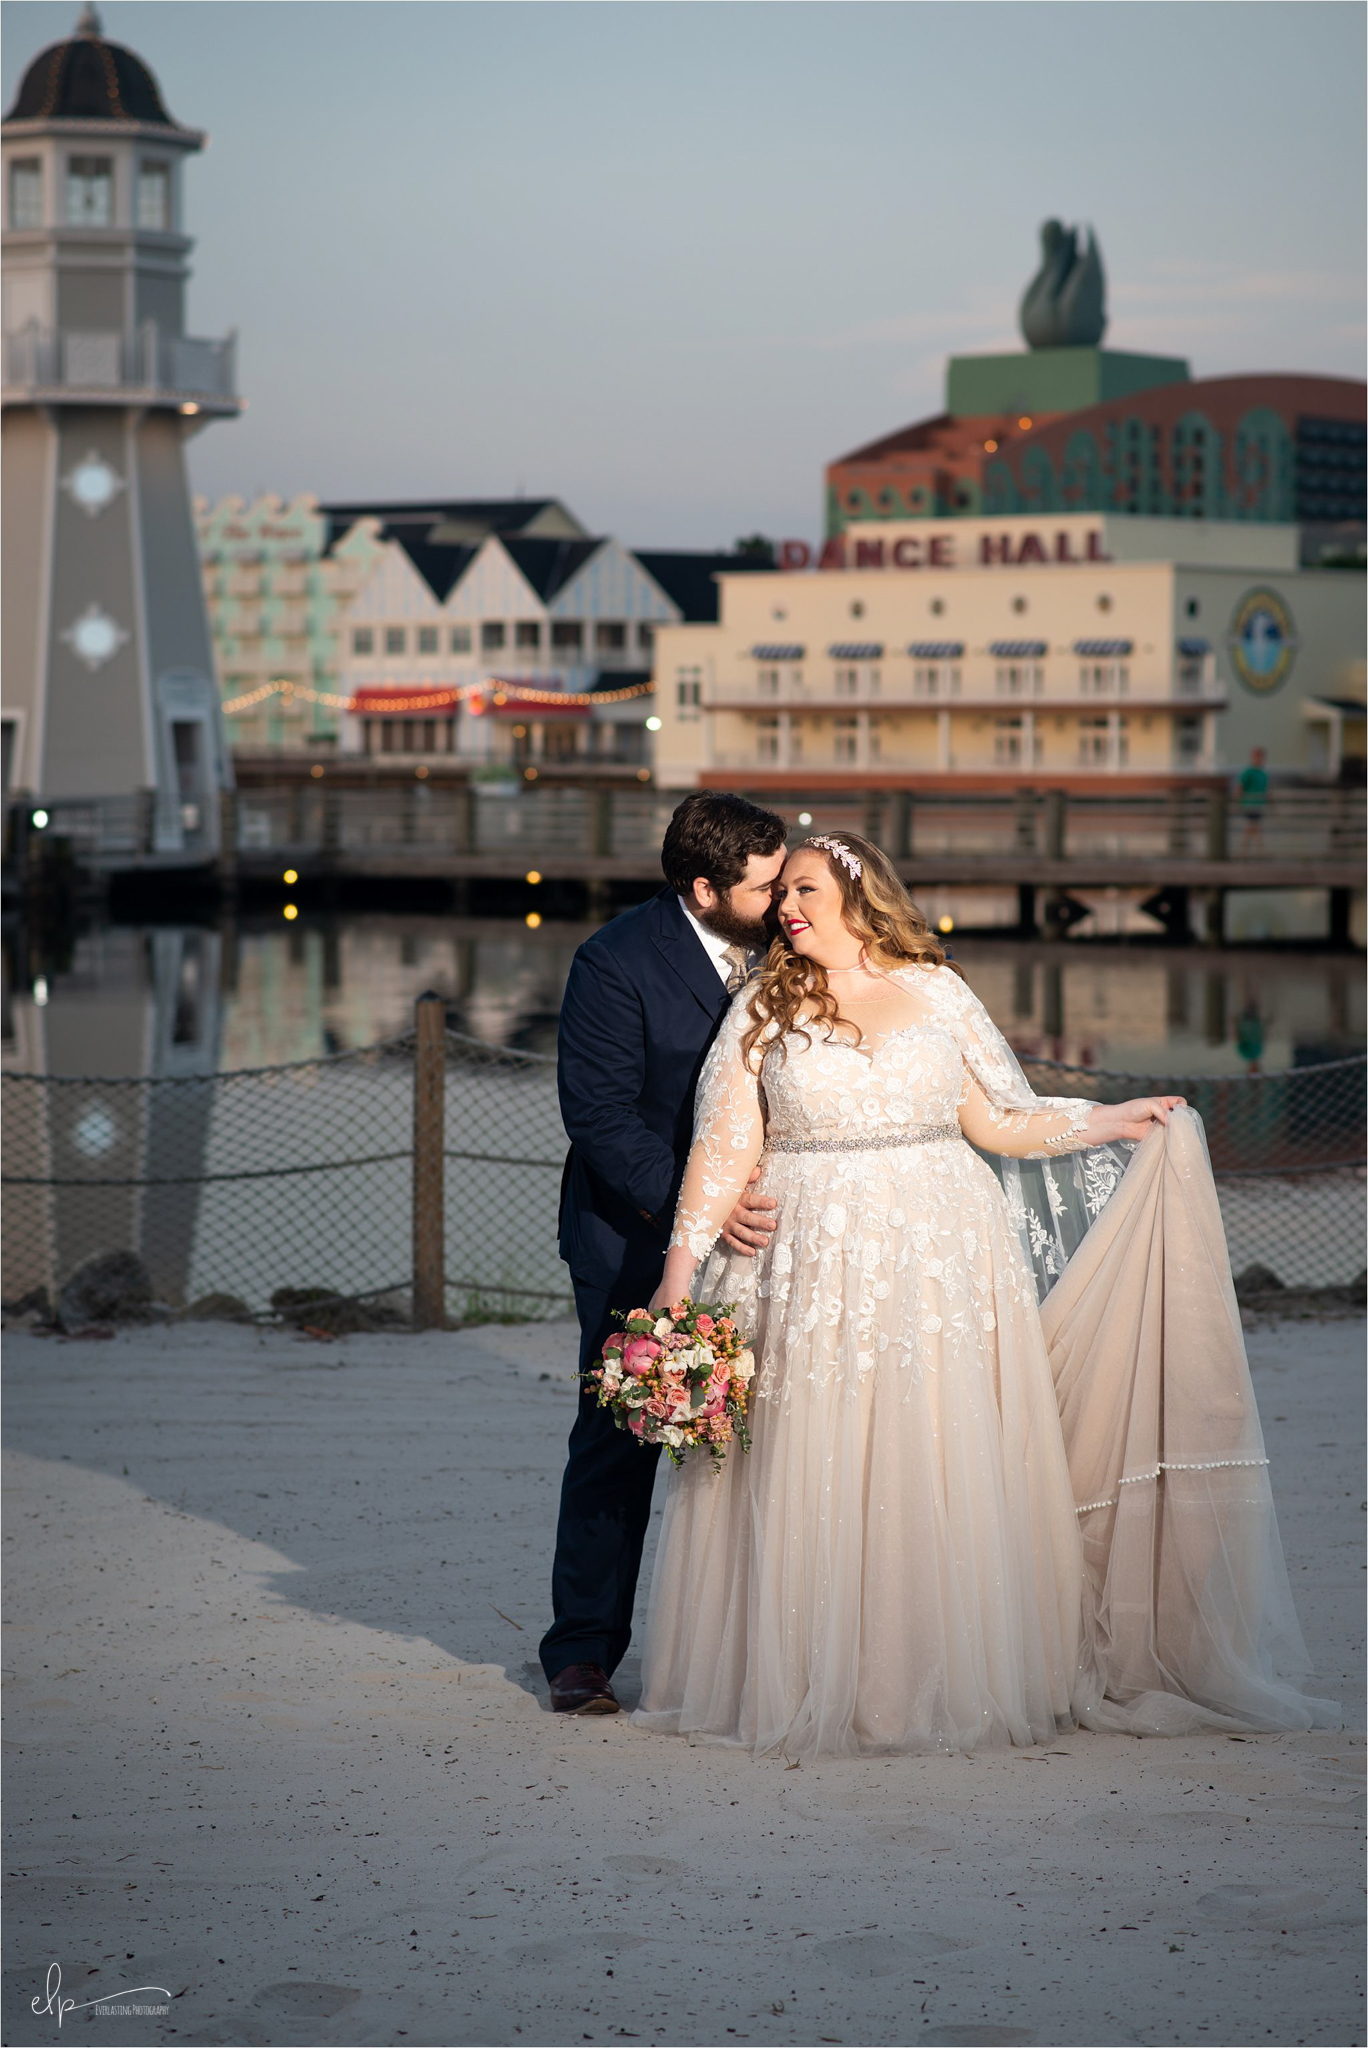 Pictures of Disney Beach Club Weddings